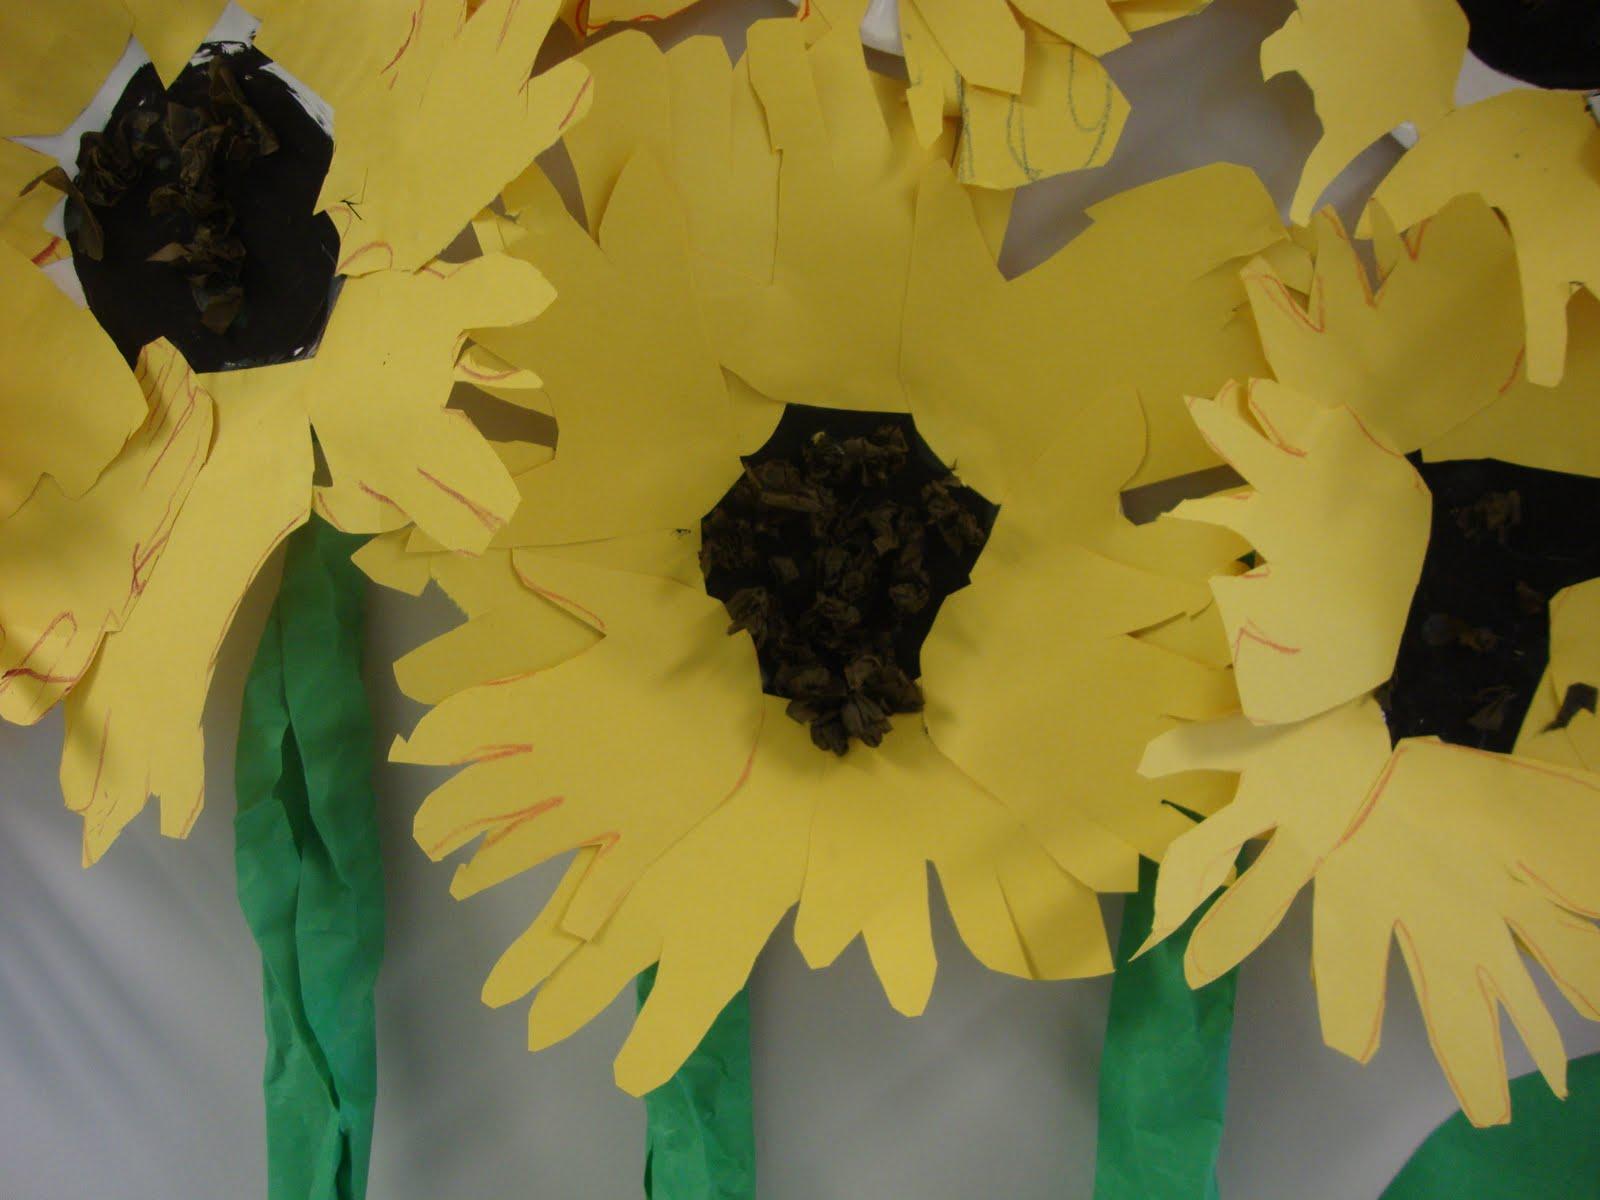 Art Paper Scissors Glue Sunflowers And Sculptures